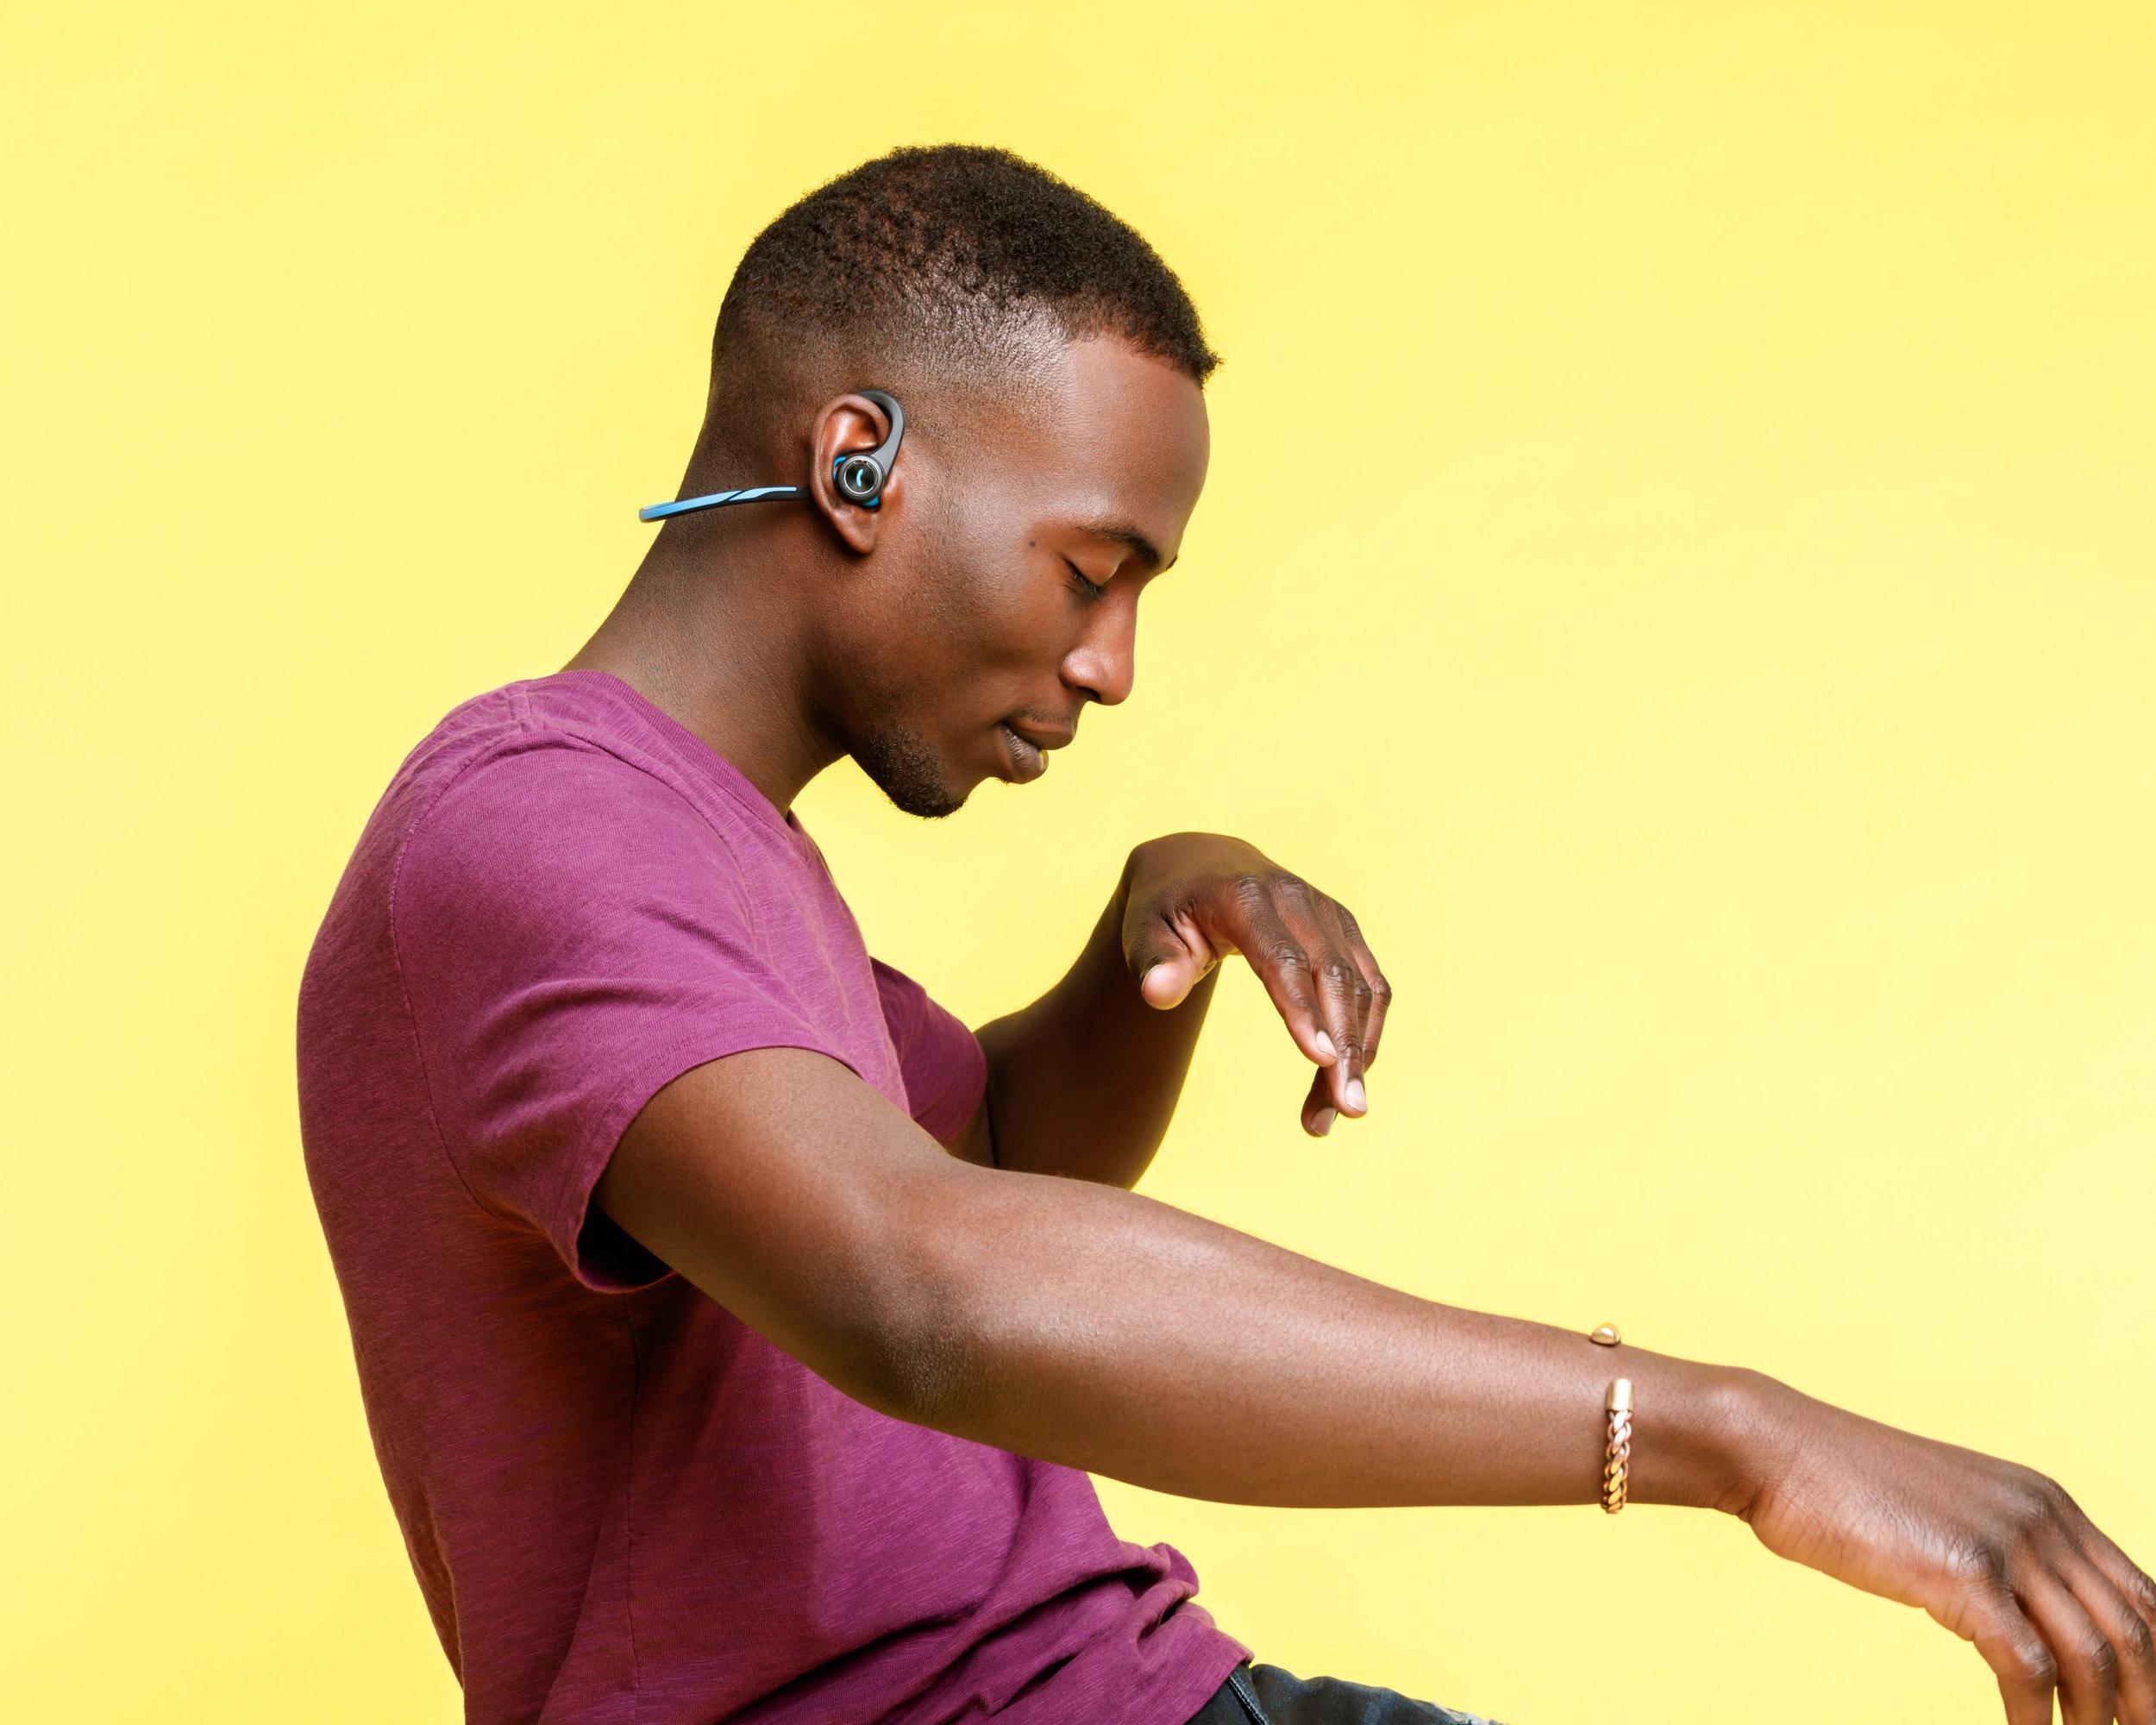 092916_MO_Ebay_Headphones_Plantronics_0190-V02.jpg